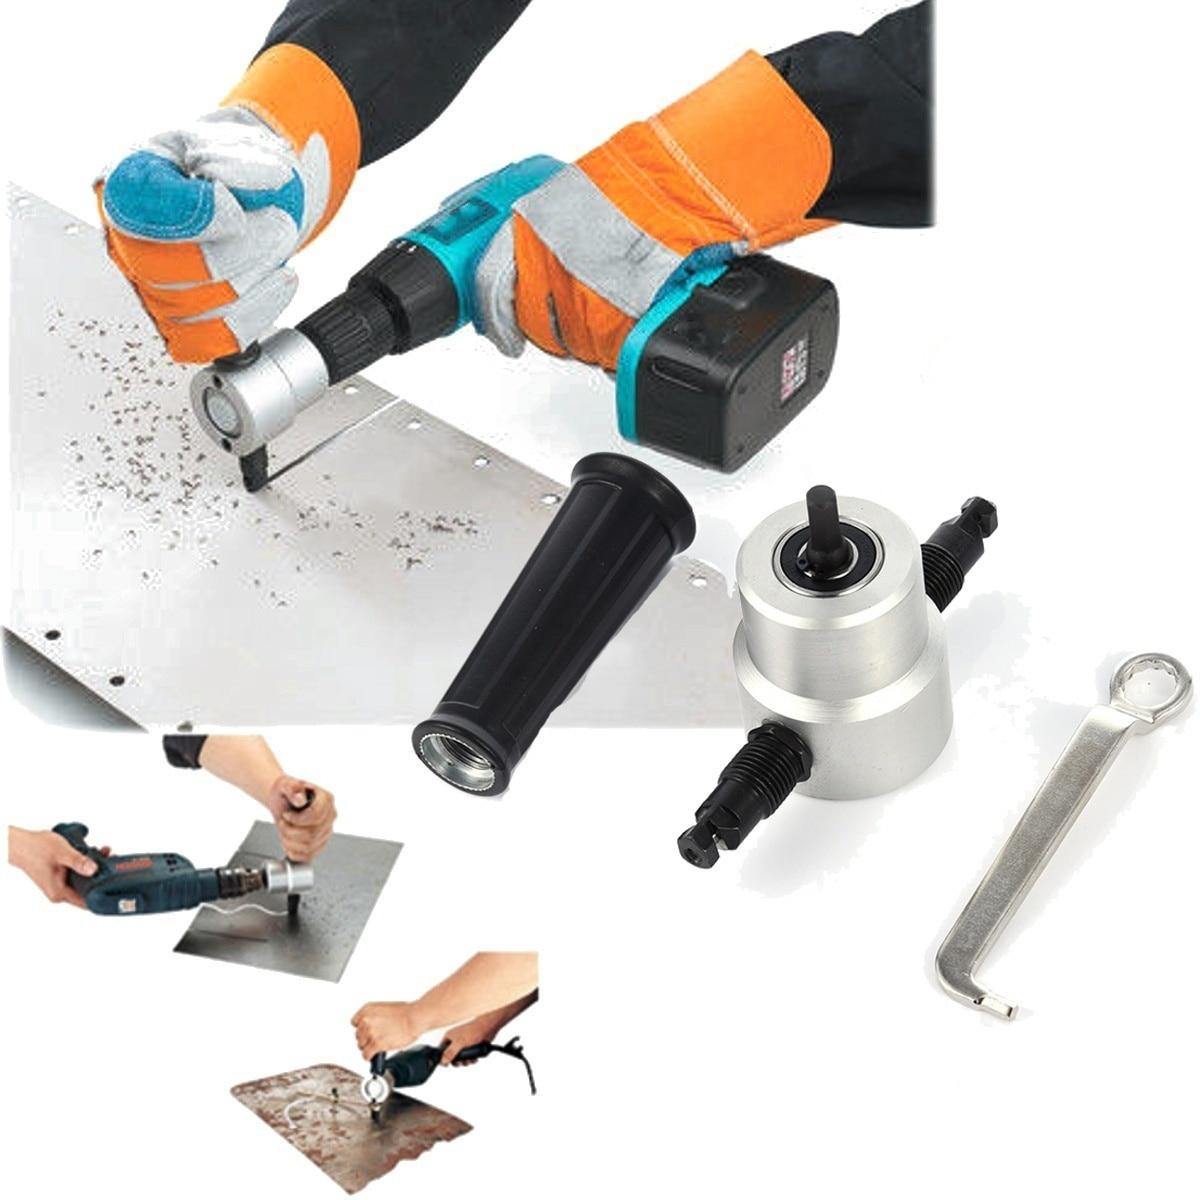 360 Degree Nibble Metal Cutting Double Head Sheet Nibbler Hole Saw Cutter Drill Tool Tackle Car Repair Metal Sheet Production